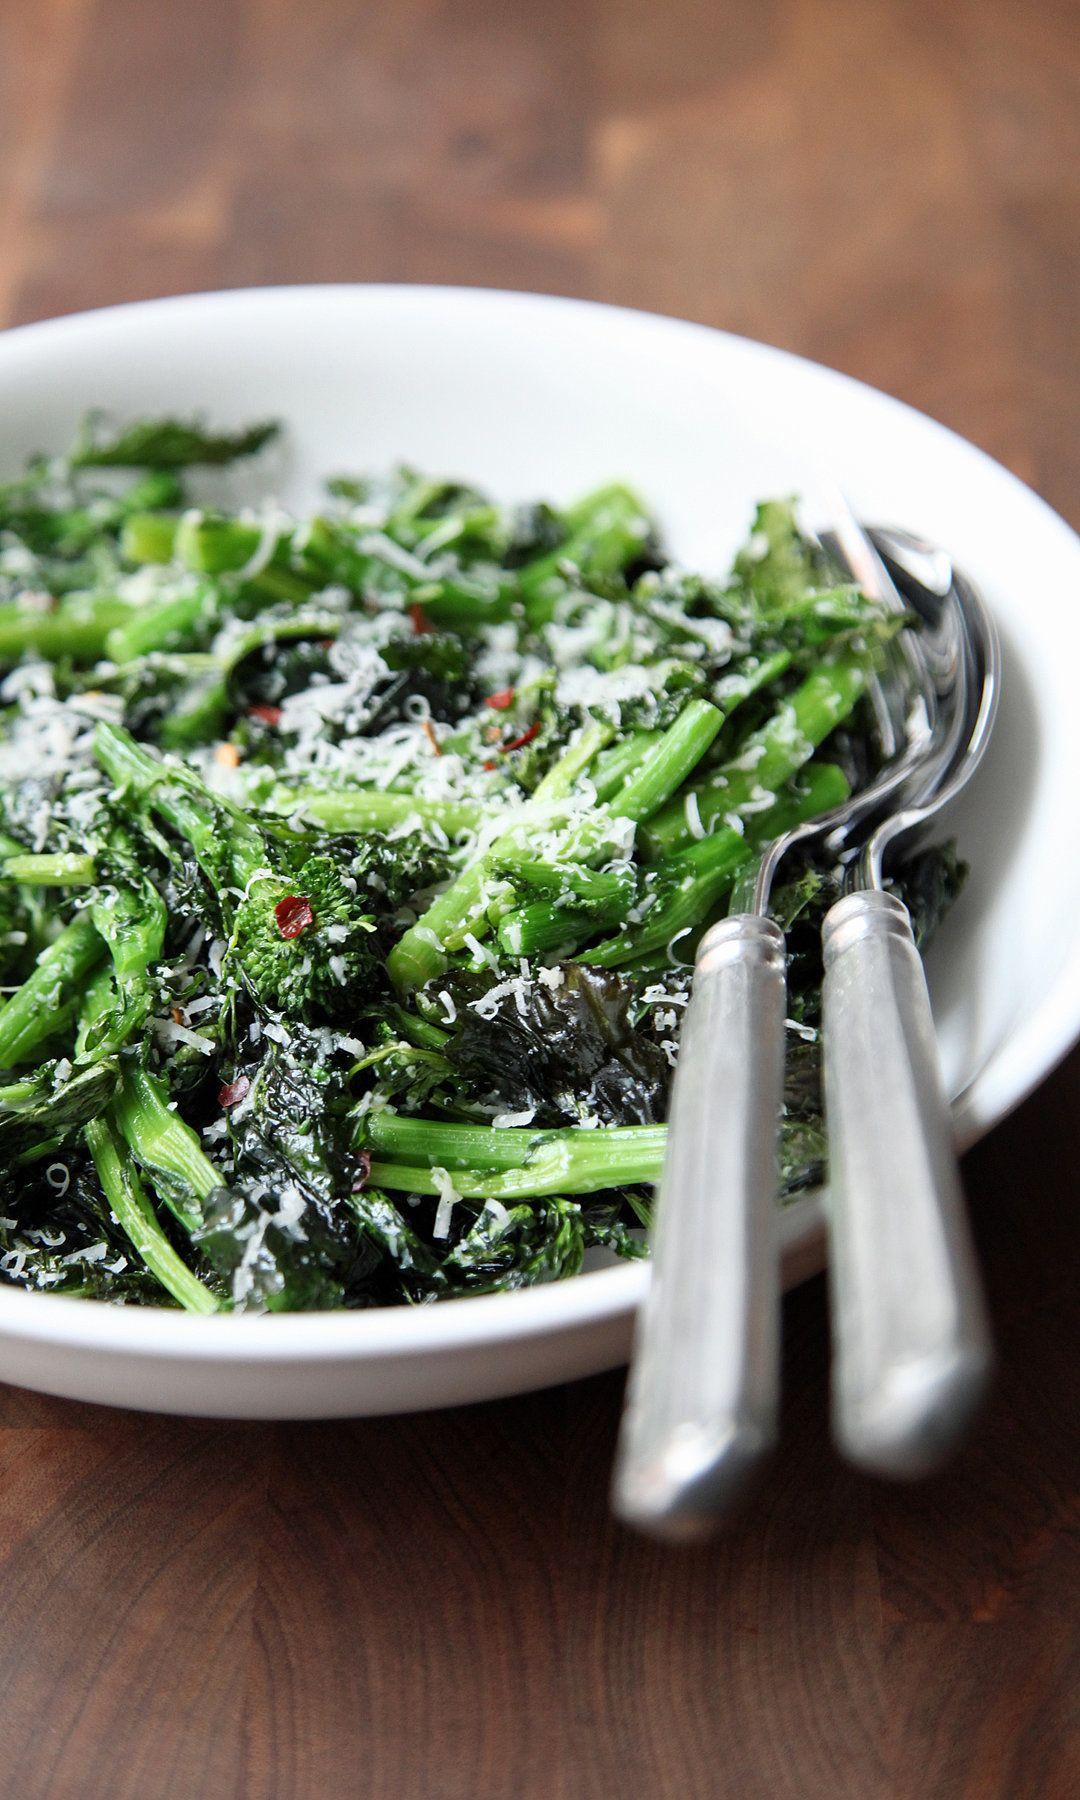 Roasted Broccoli Rabe With Lemon, Chili Flakes, and ...